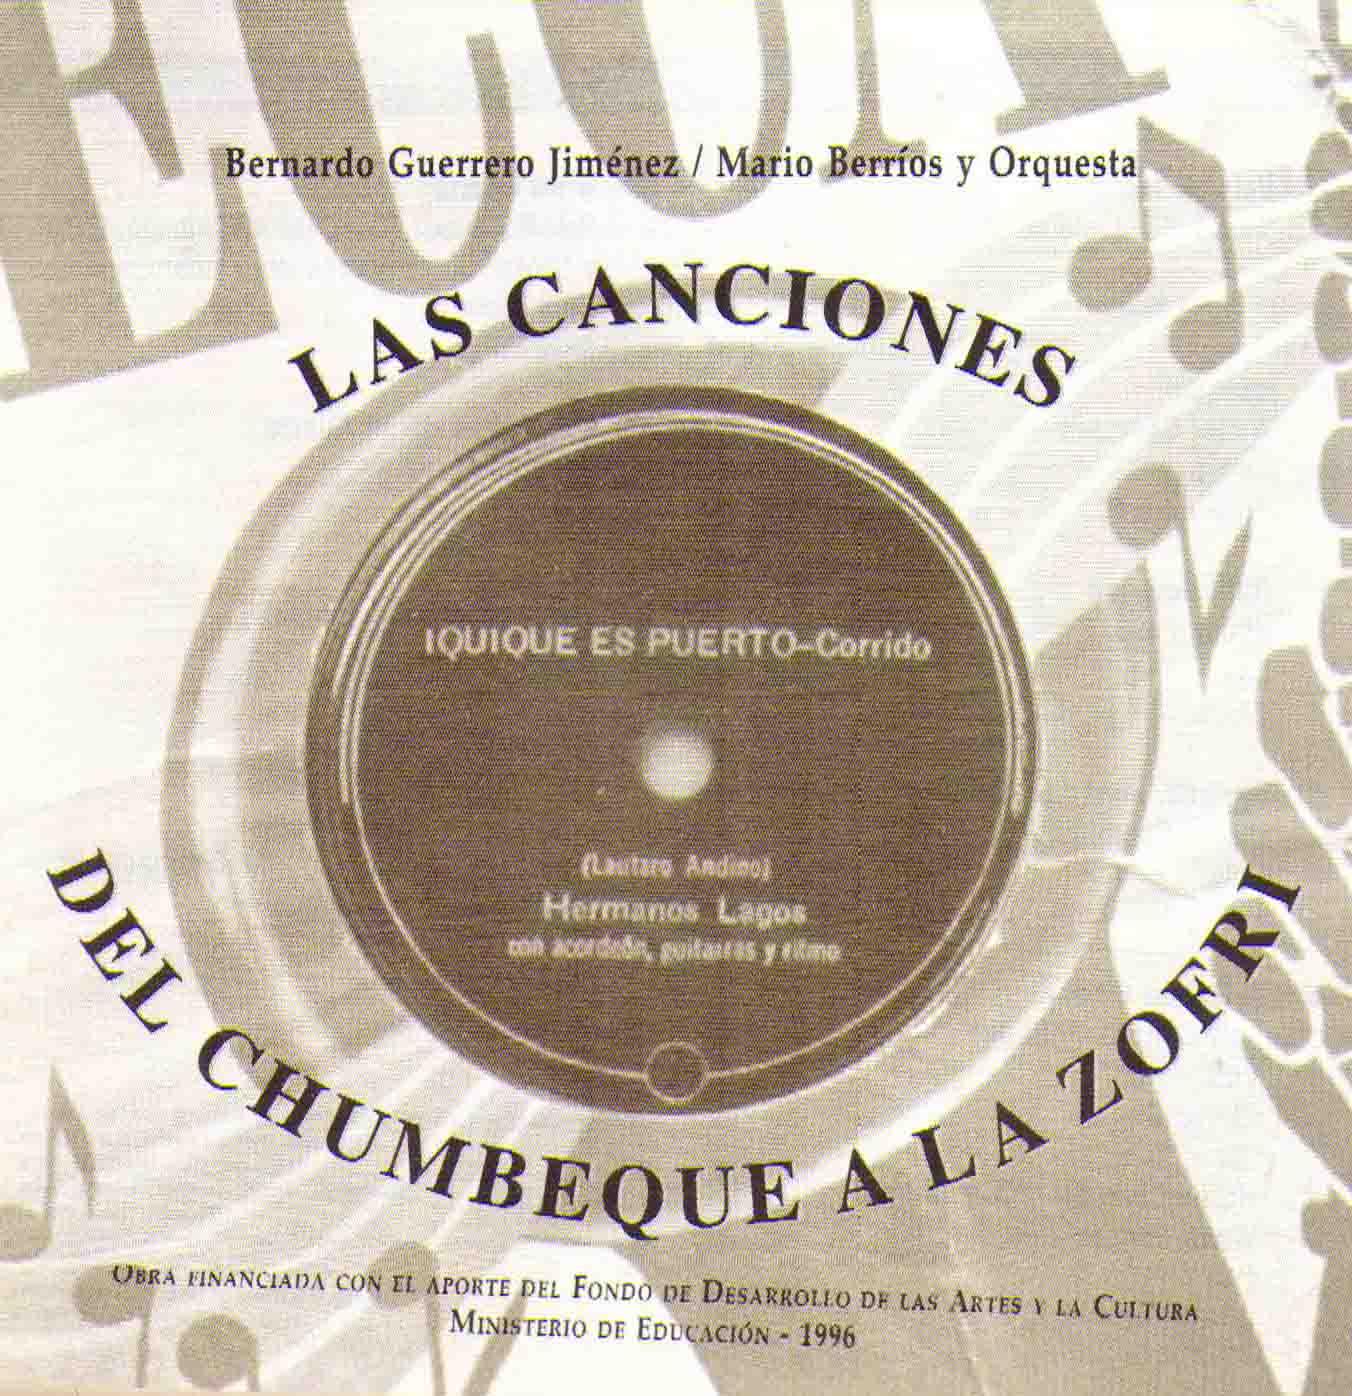 Las canciones del Chumbeque a la Zofri